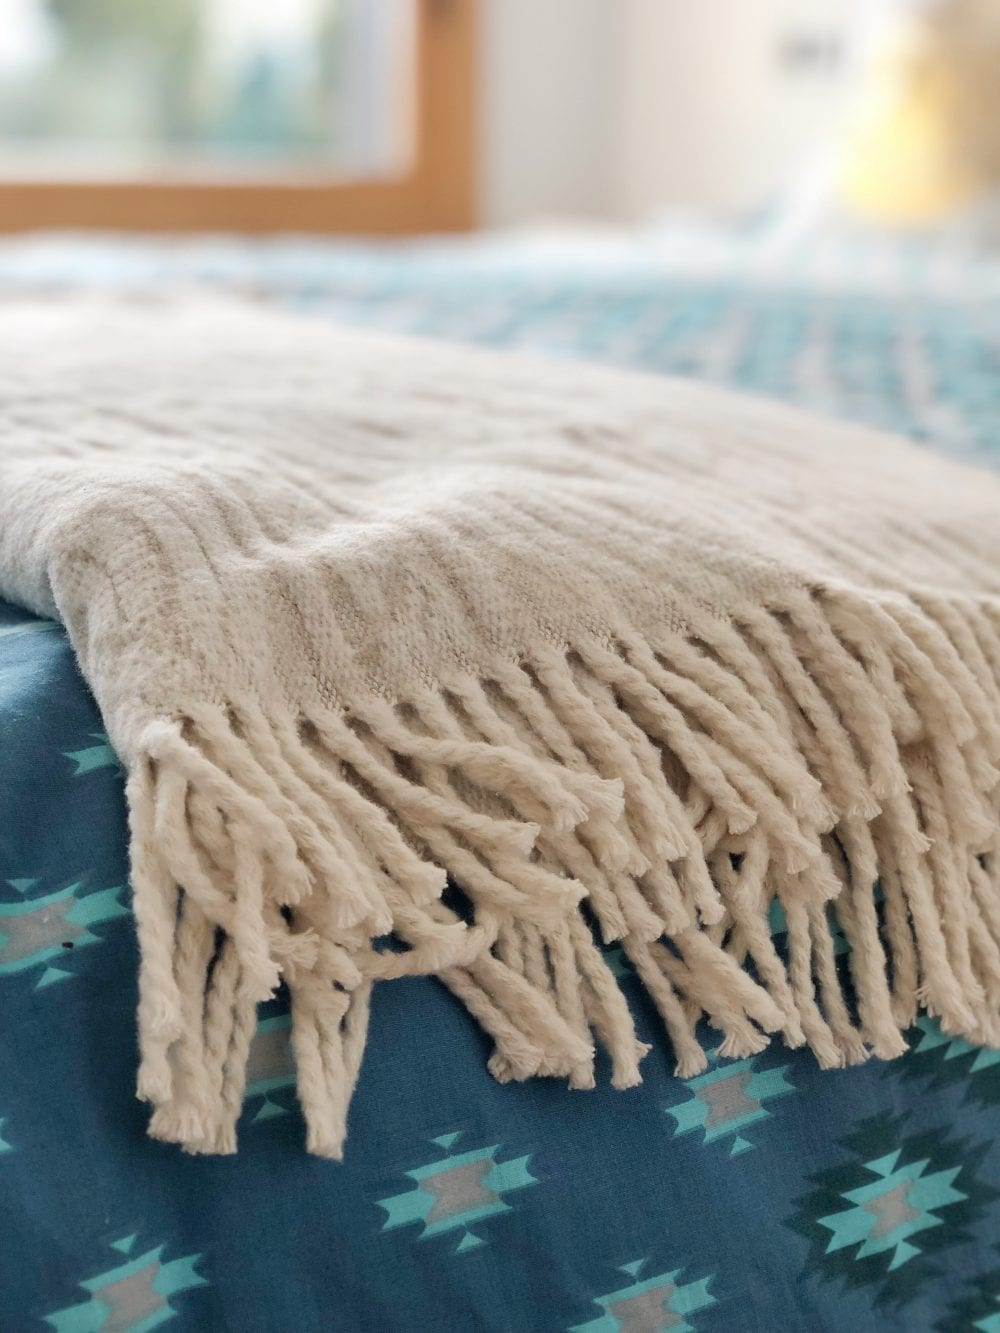 Shopping / Textil para el hogar